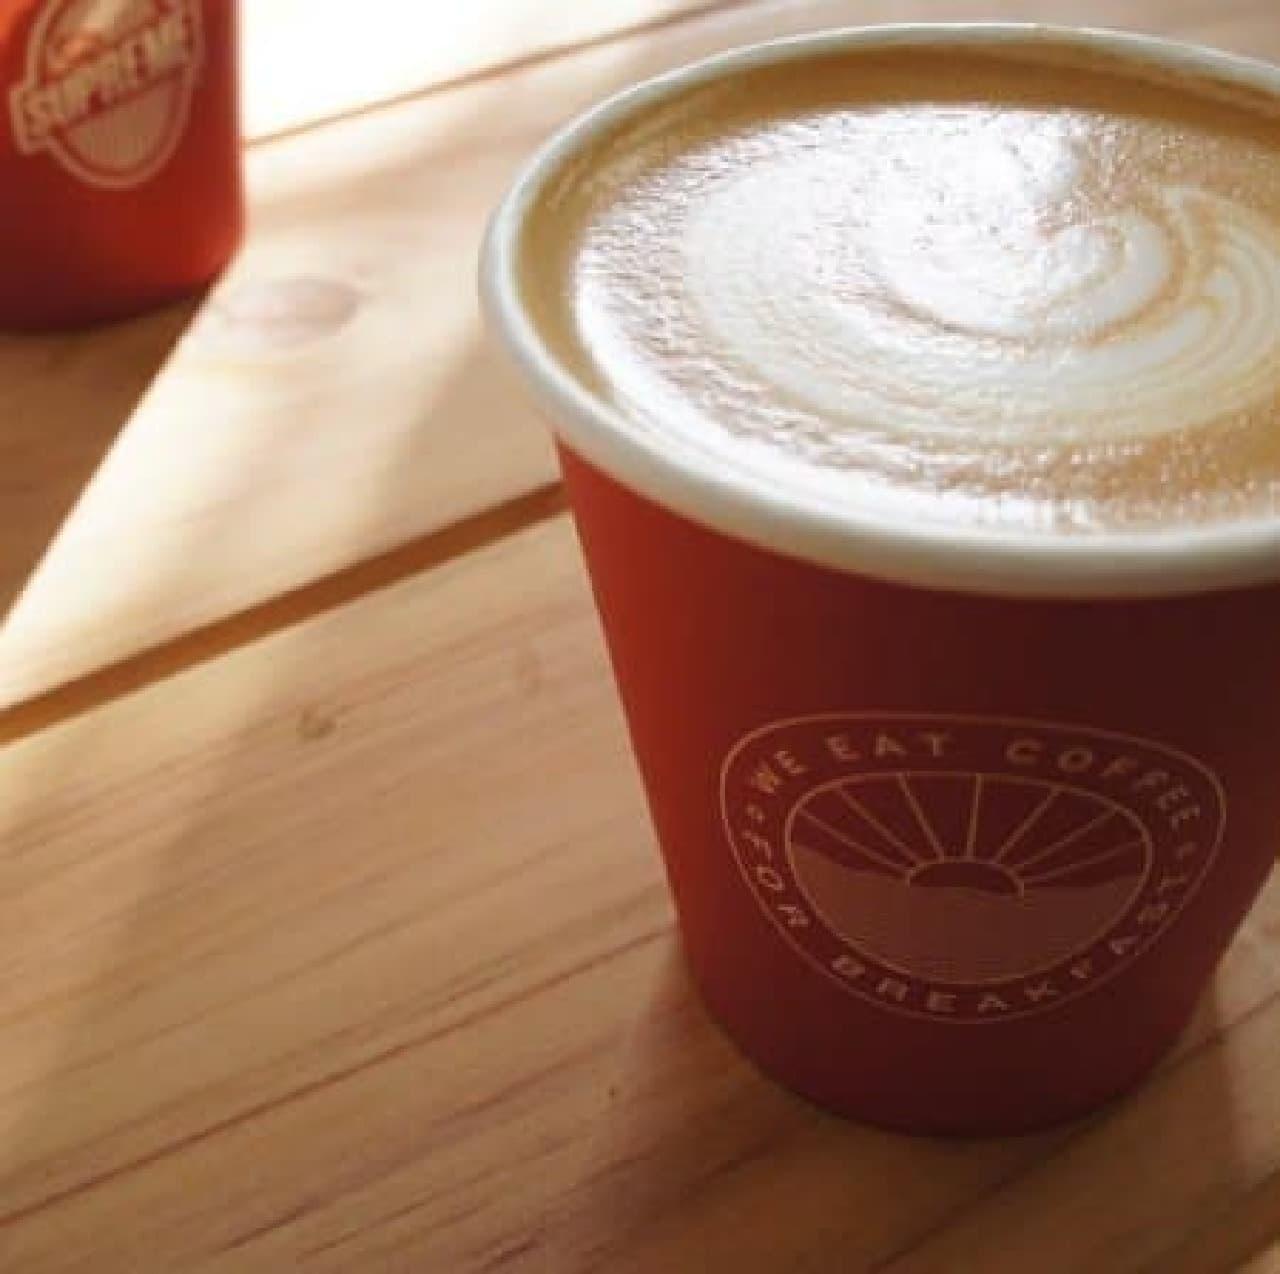 Coffee Supreme Tokyo(コーヒー・スプリーム・トウキョウ)